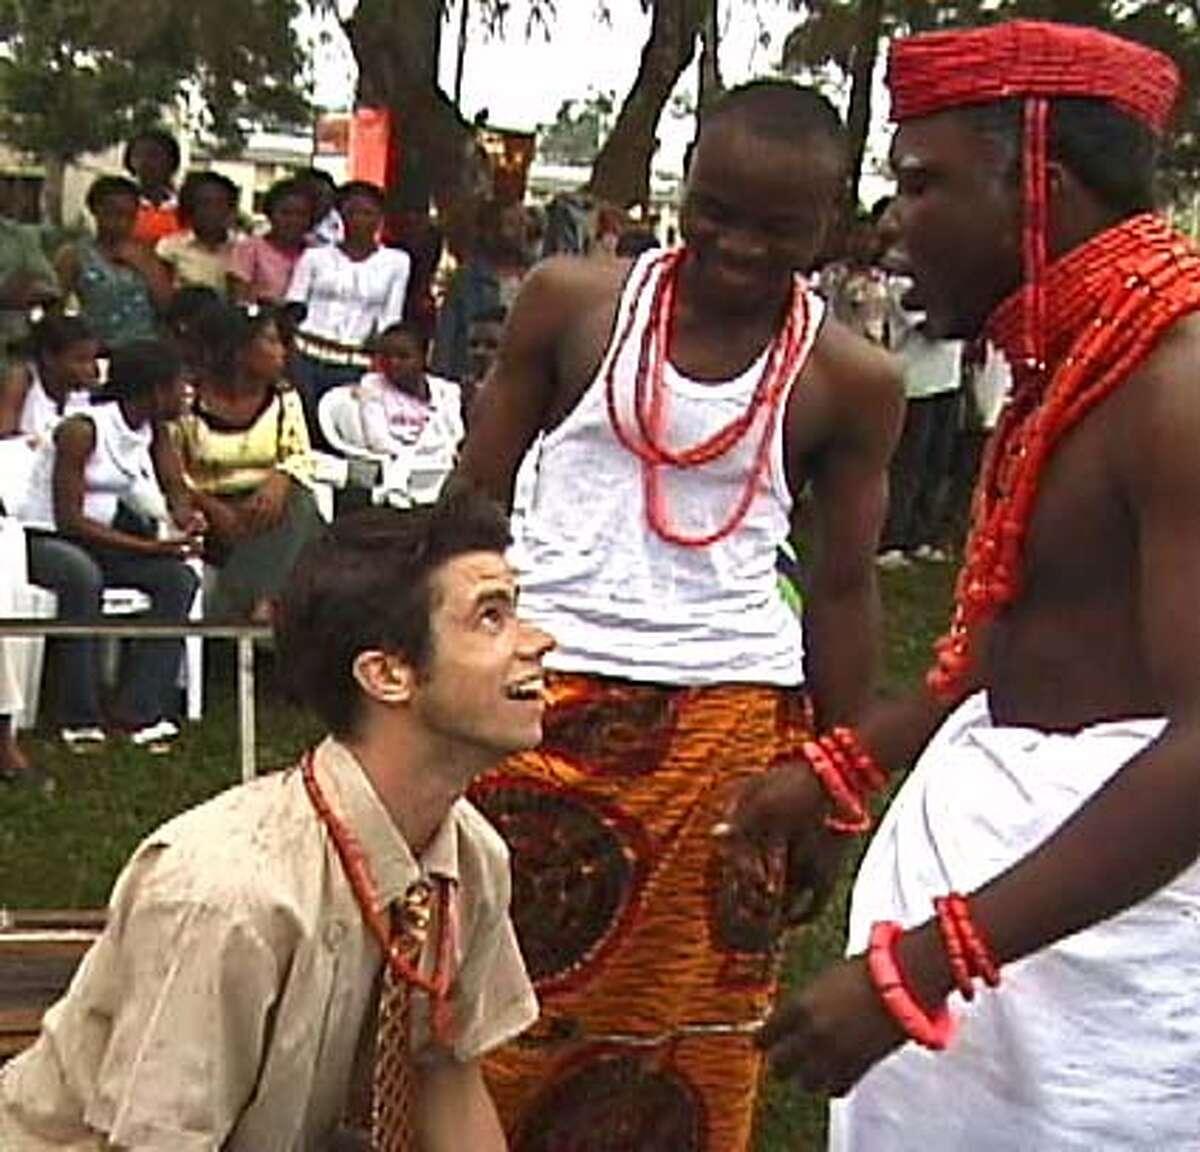 Still from a video of Dan Hoyle in Nigeria. -